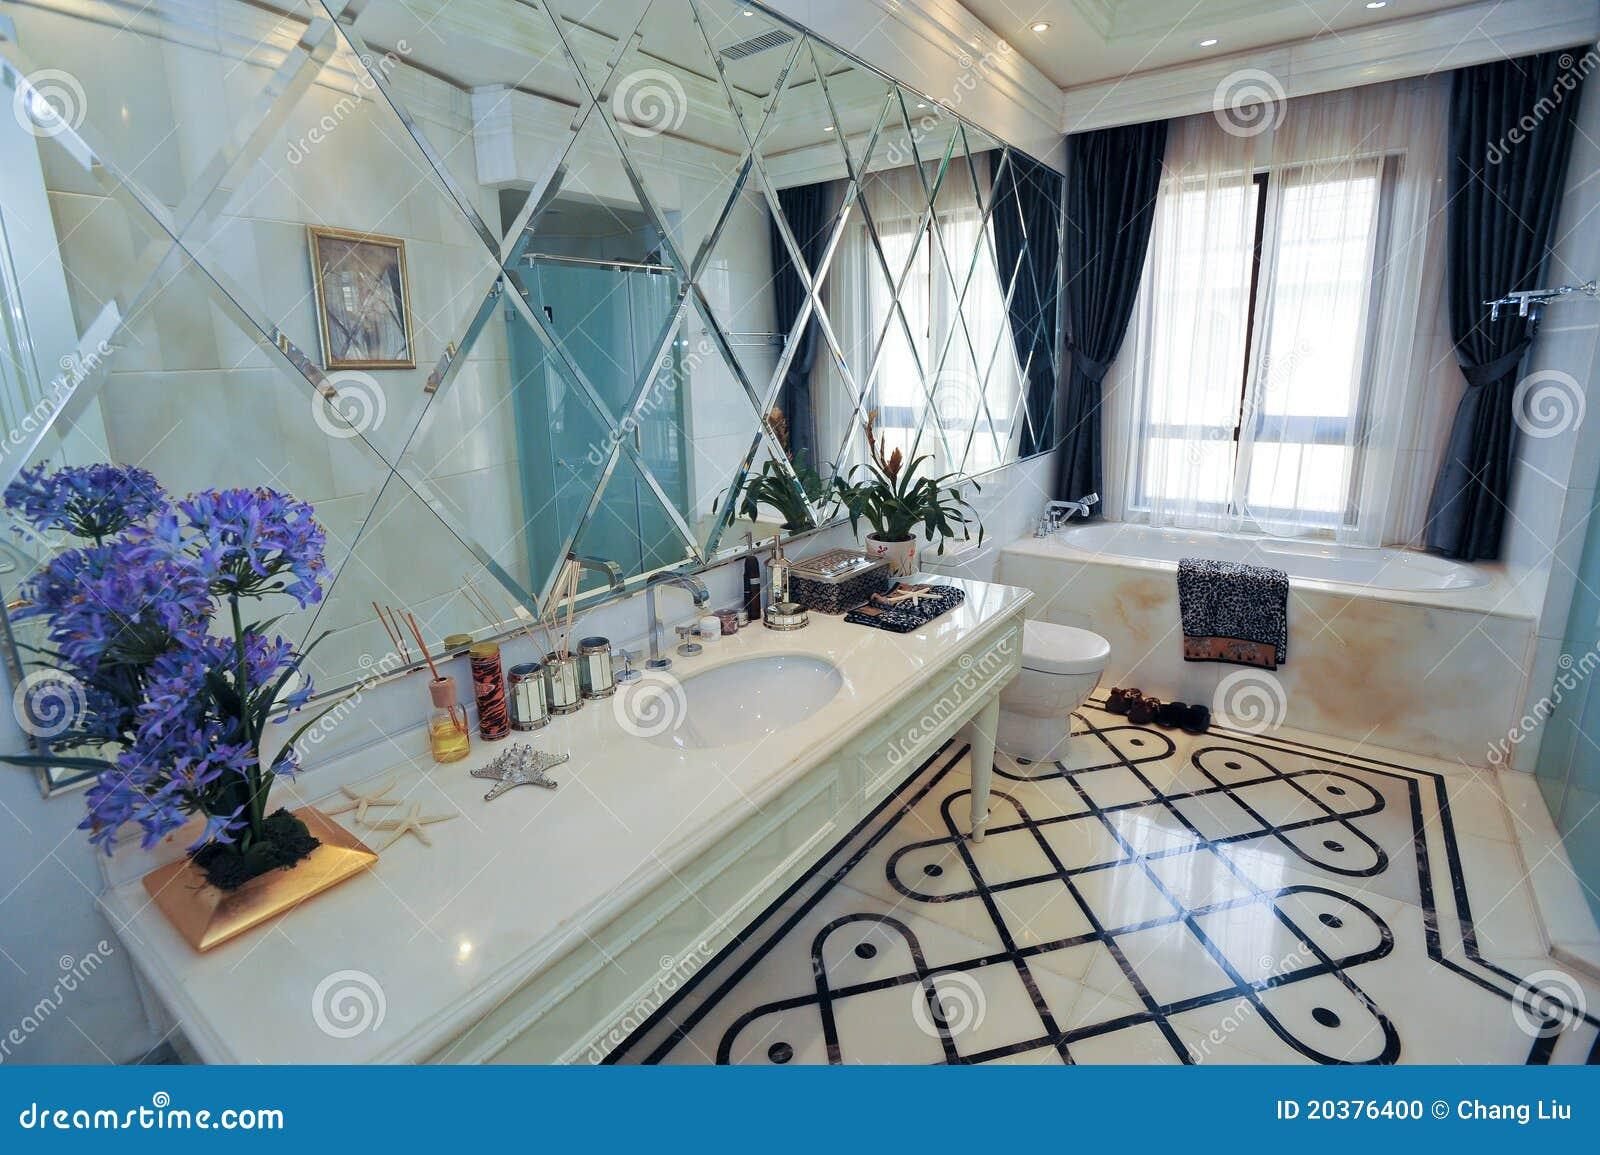 White And Blue Bathroom Stock Photo Image 20376400